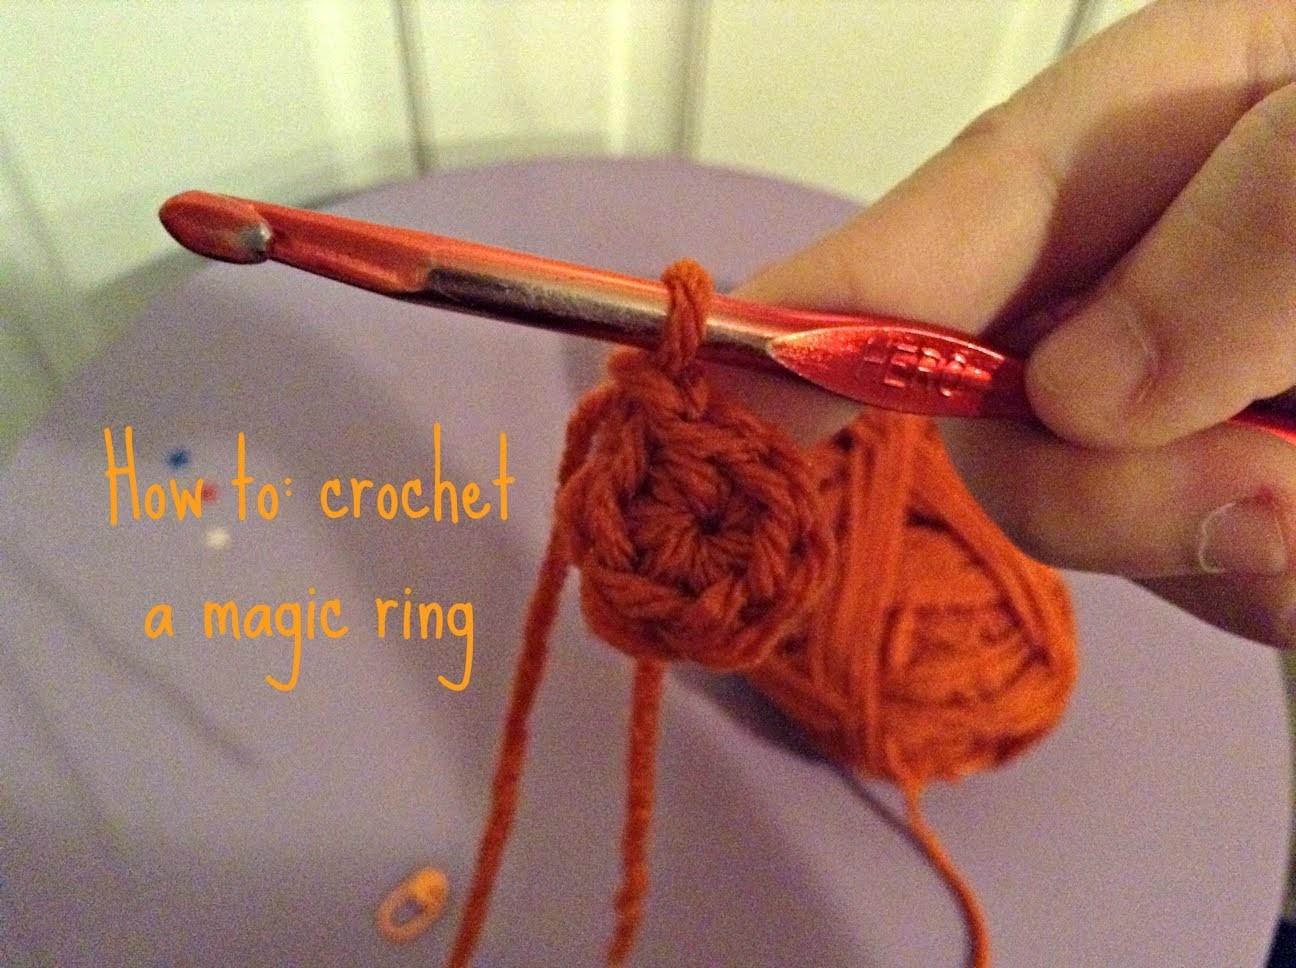 Crochet: Magic ring tutorial